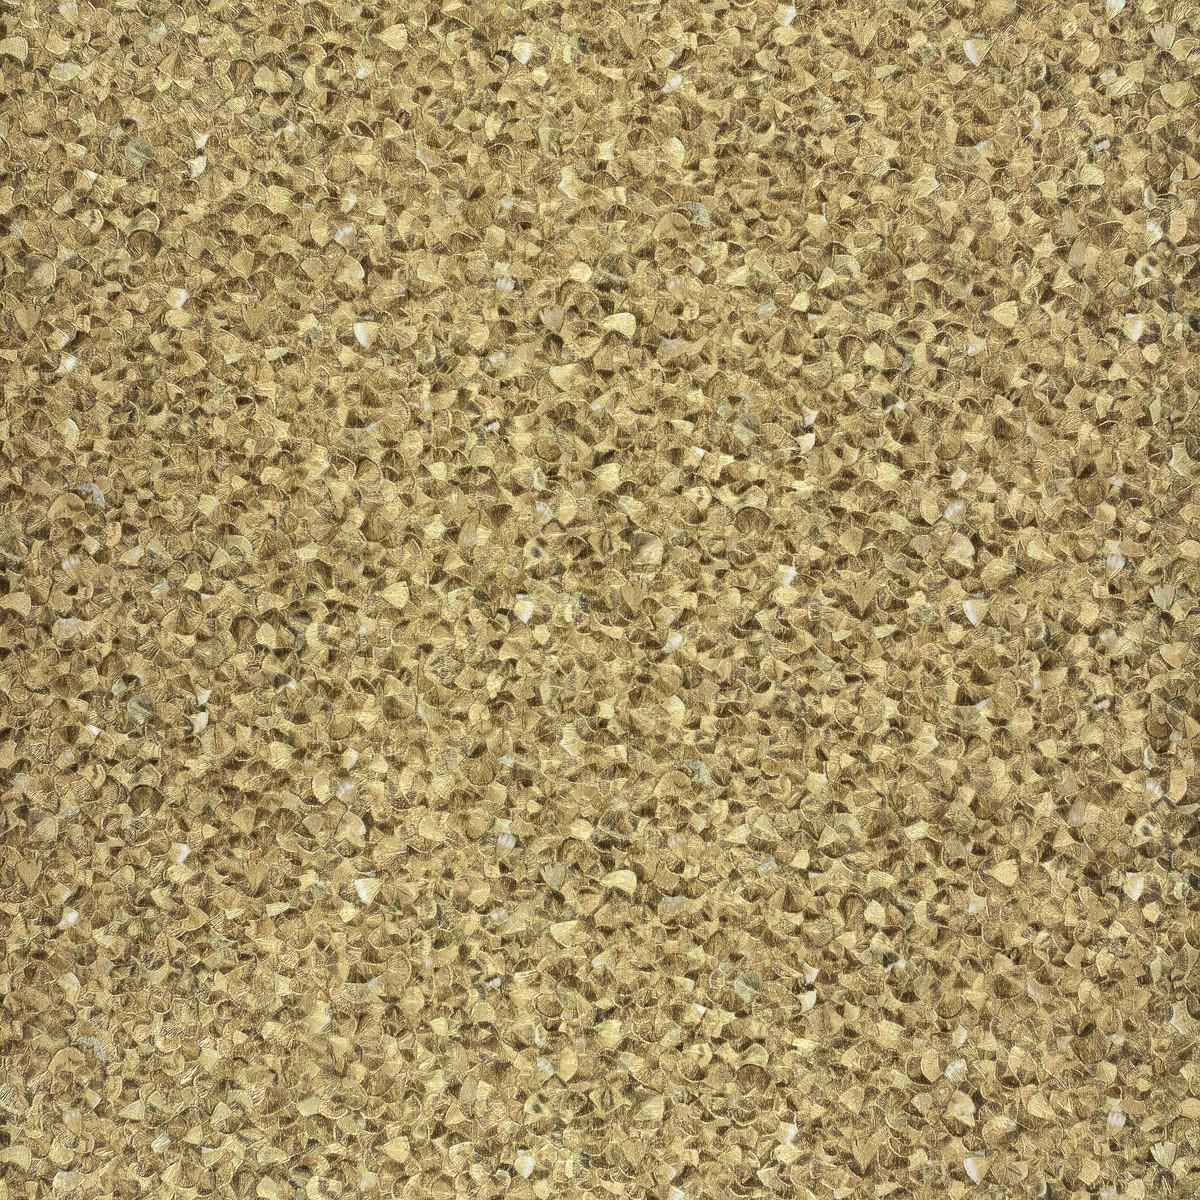 Wallpaper Gloockler Feathers Gold Metallic